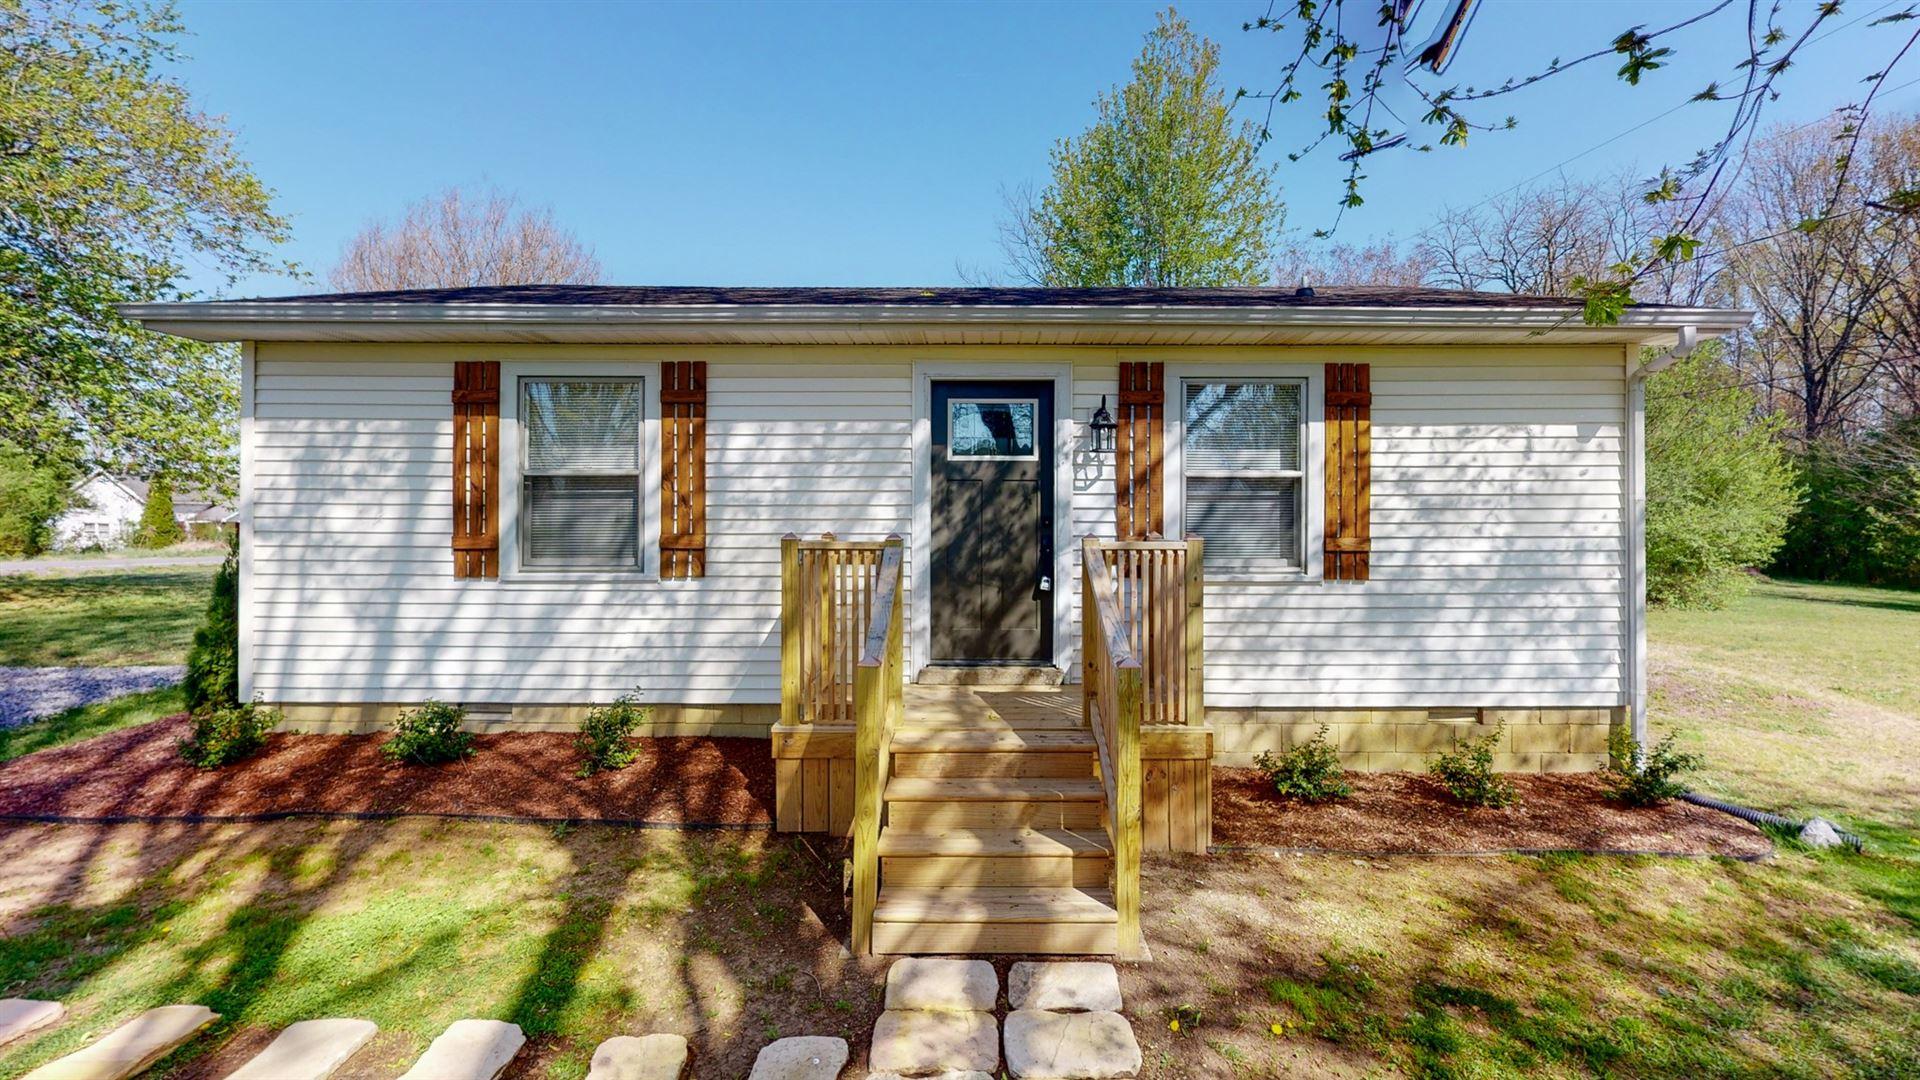 126 New Deal Potts Rd, Cottontown, TN 37048 - MLS#: 2241815